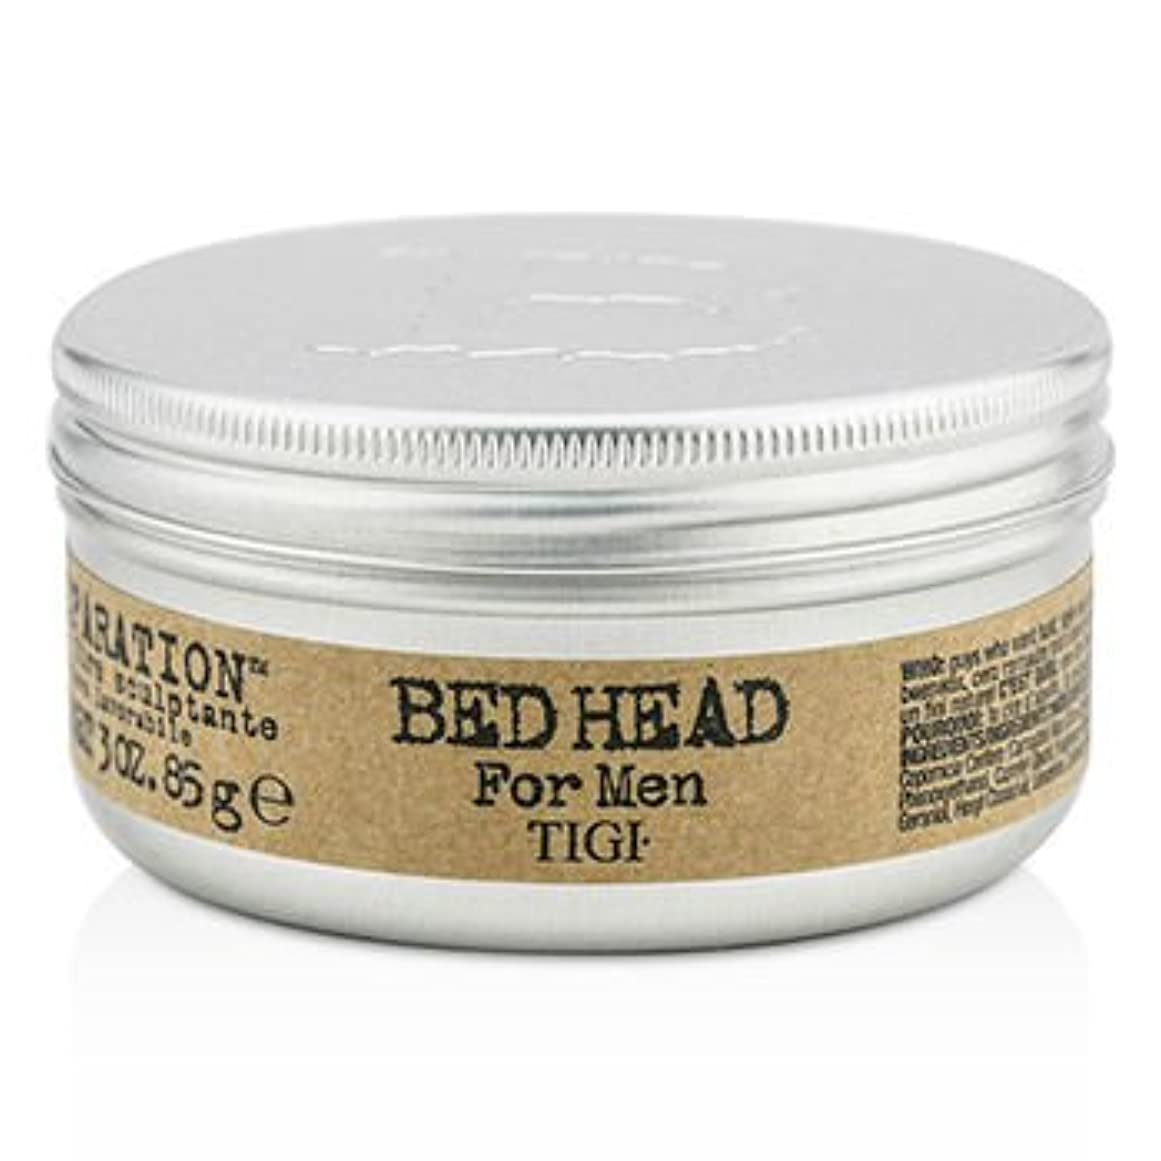 [Tigi] Bed Head B For Men Matte Separation Workable Wax 85g/3oz